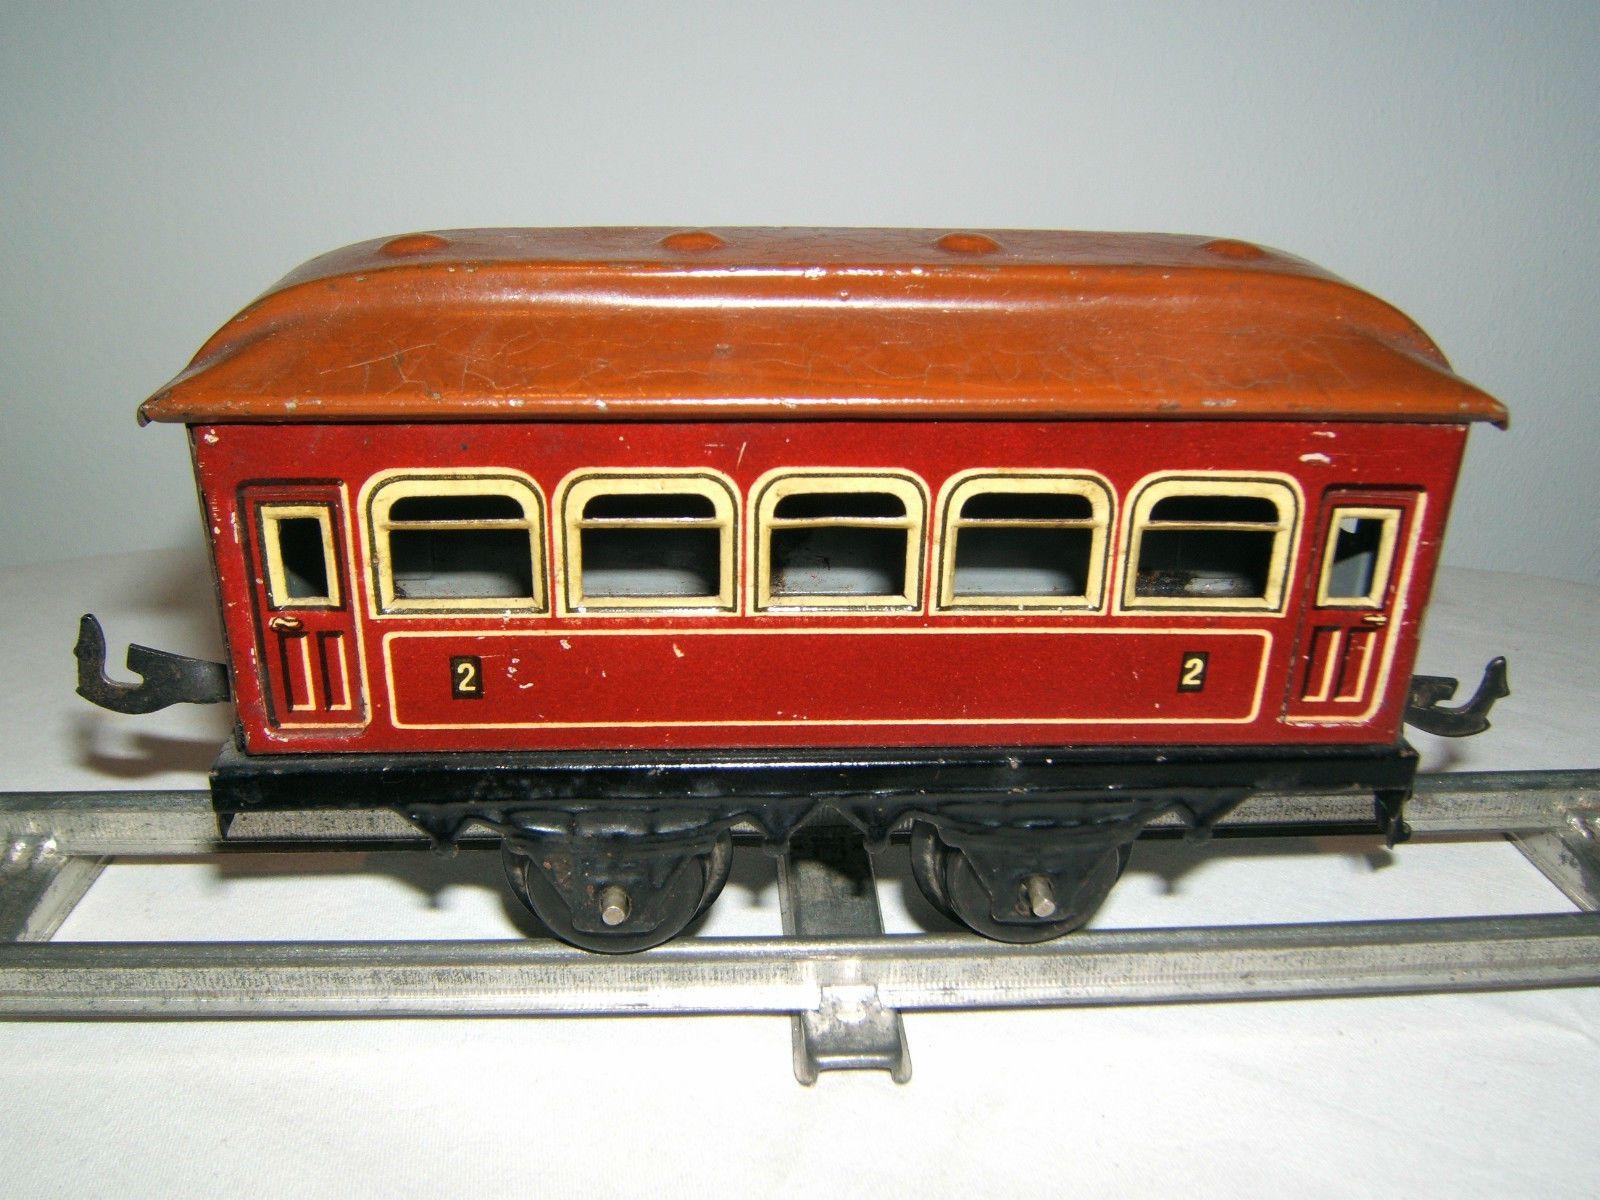 Bing Werke seltener Personenwaggon, rot, Spur 0, Blech, Germany, 1930er Jahre